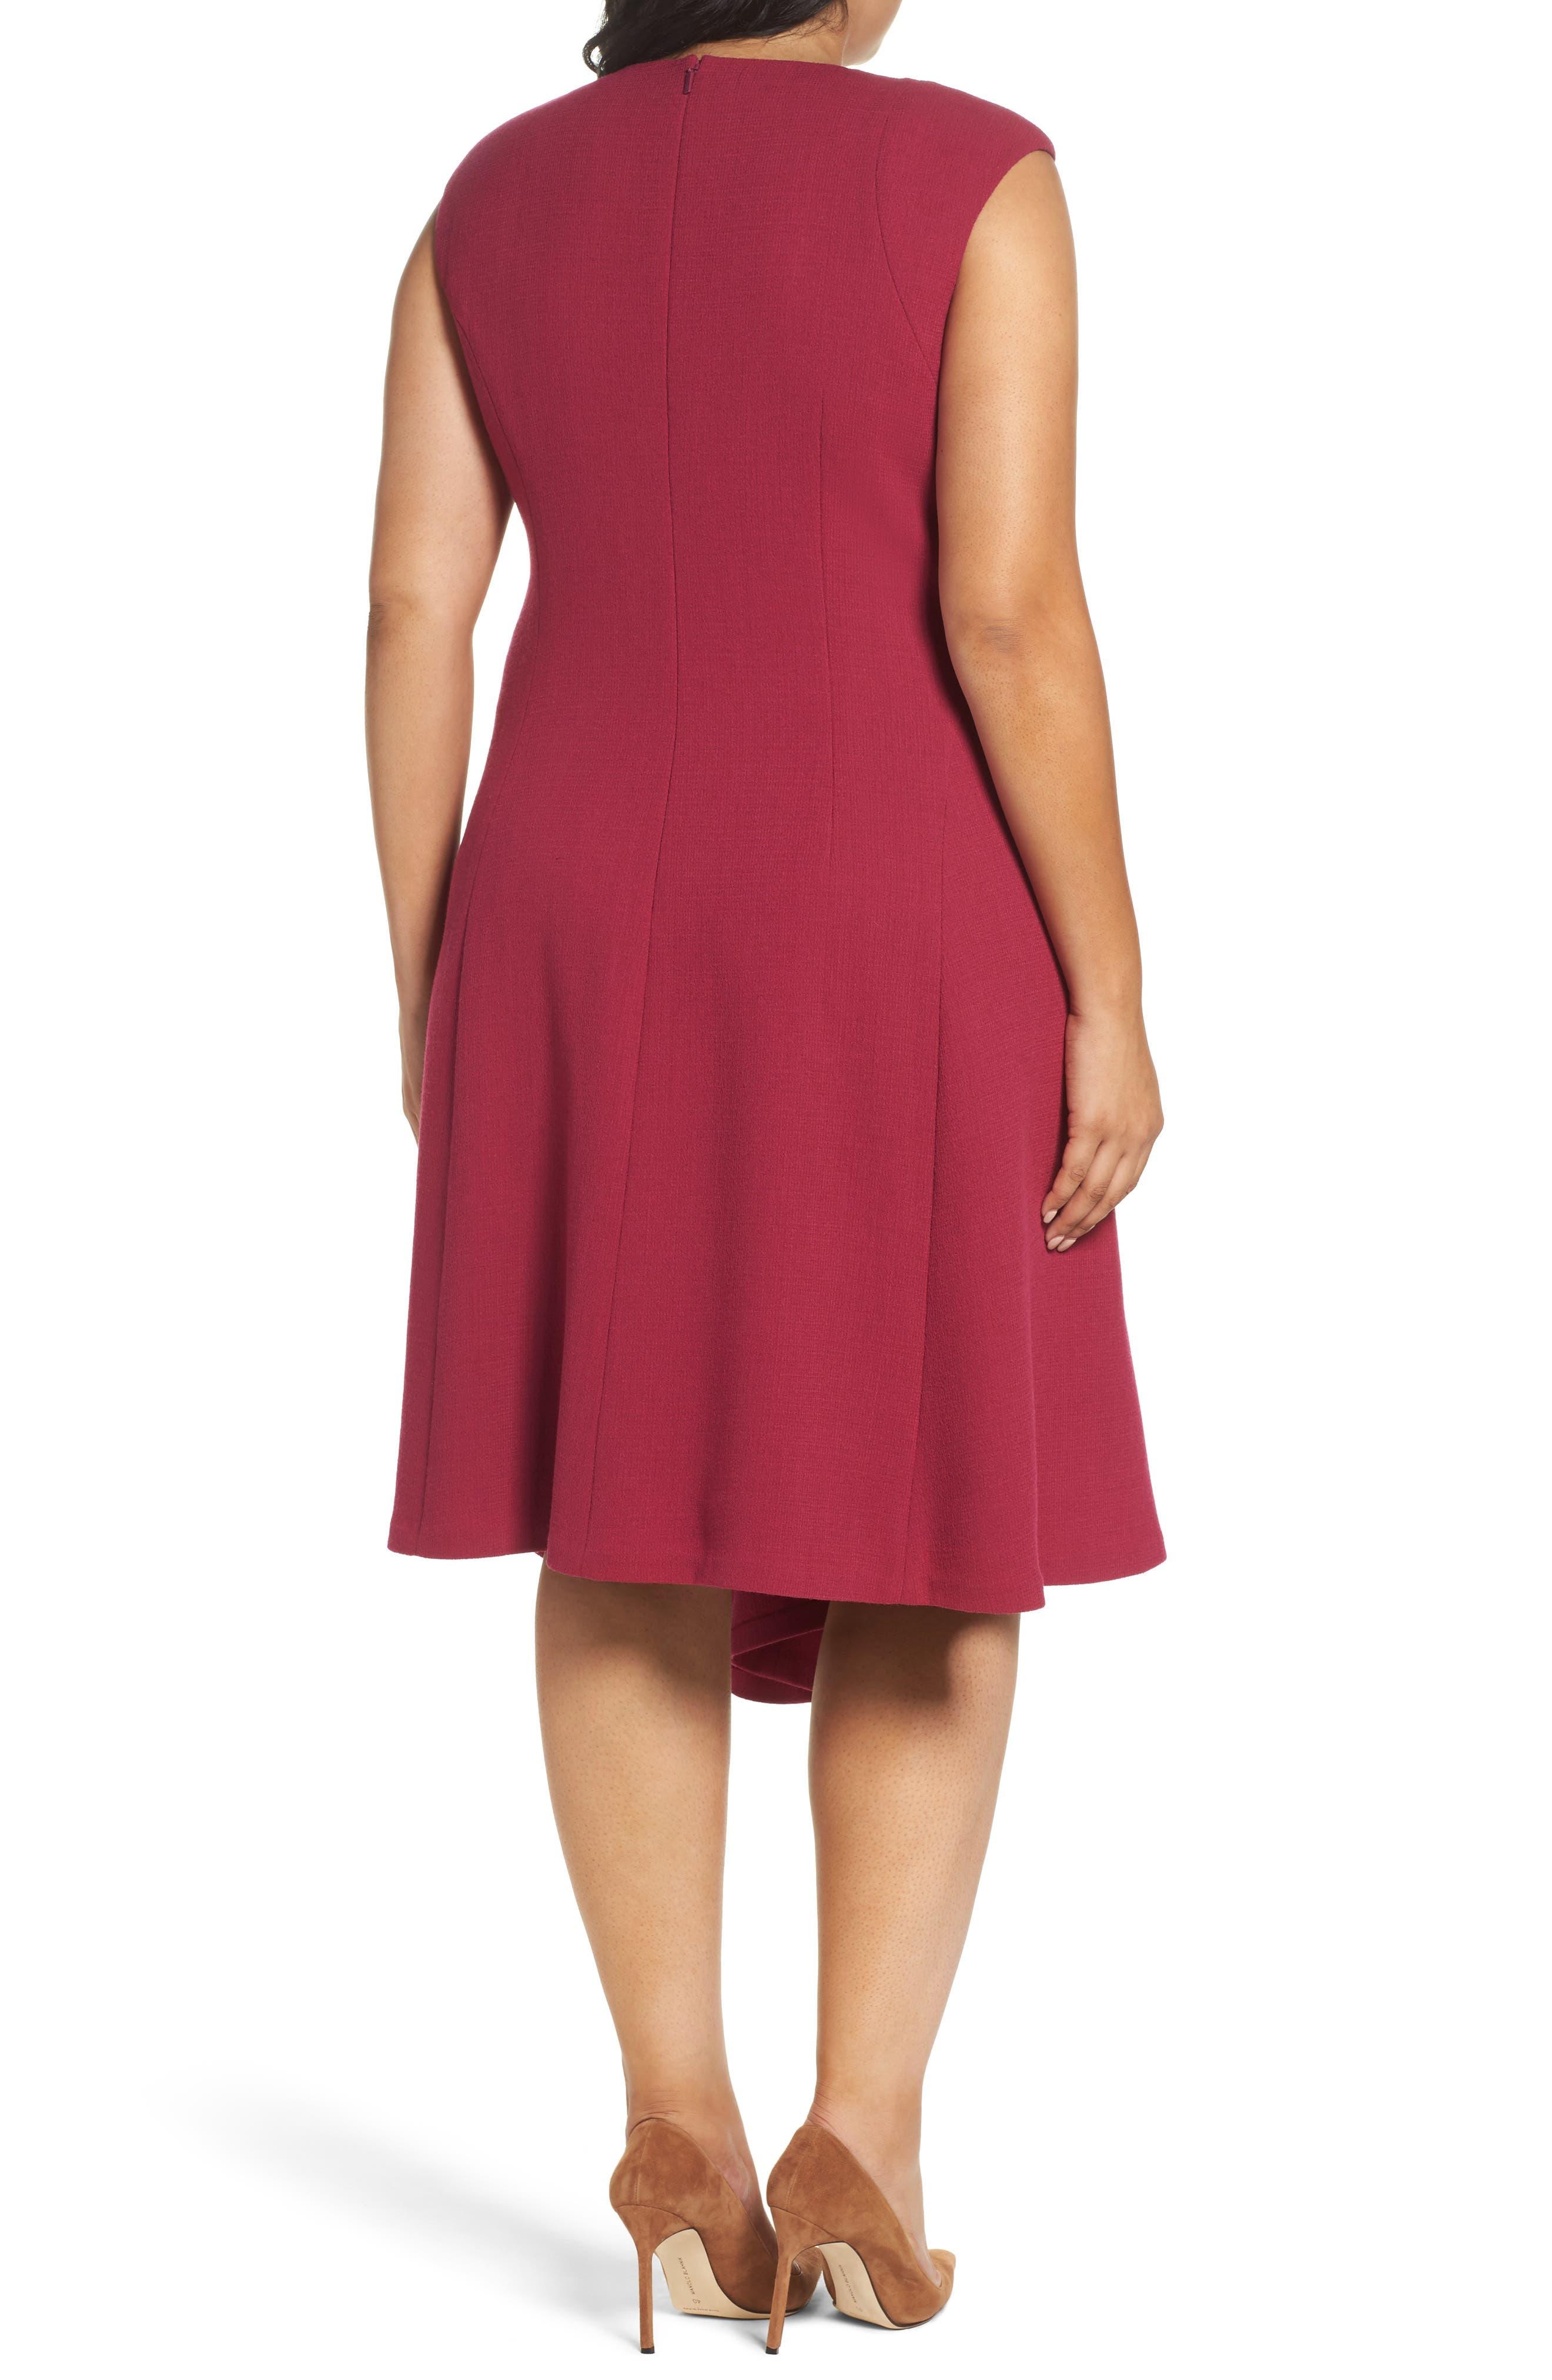 Alternate Image 2  - Lafayette 148 New York Aveena Wool Interlock Dress (Plus Size)